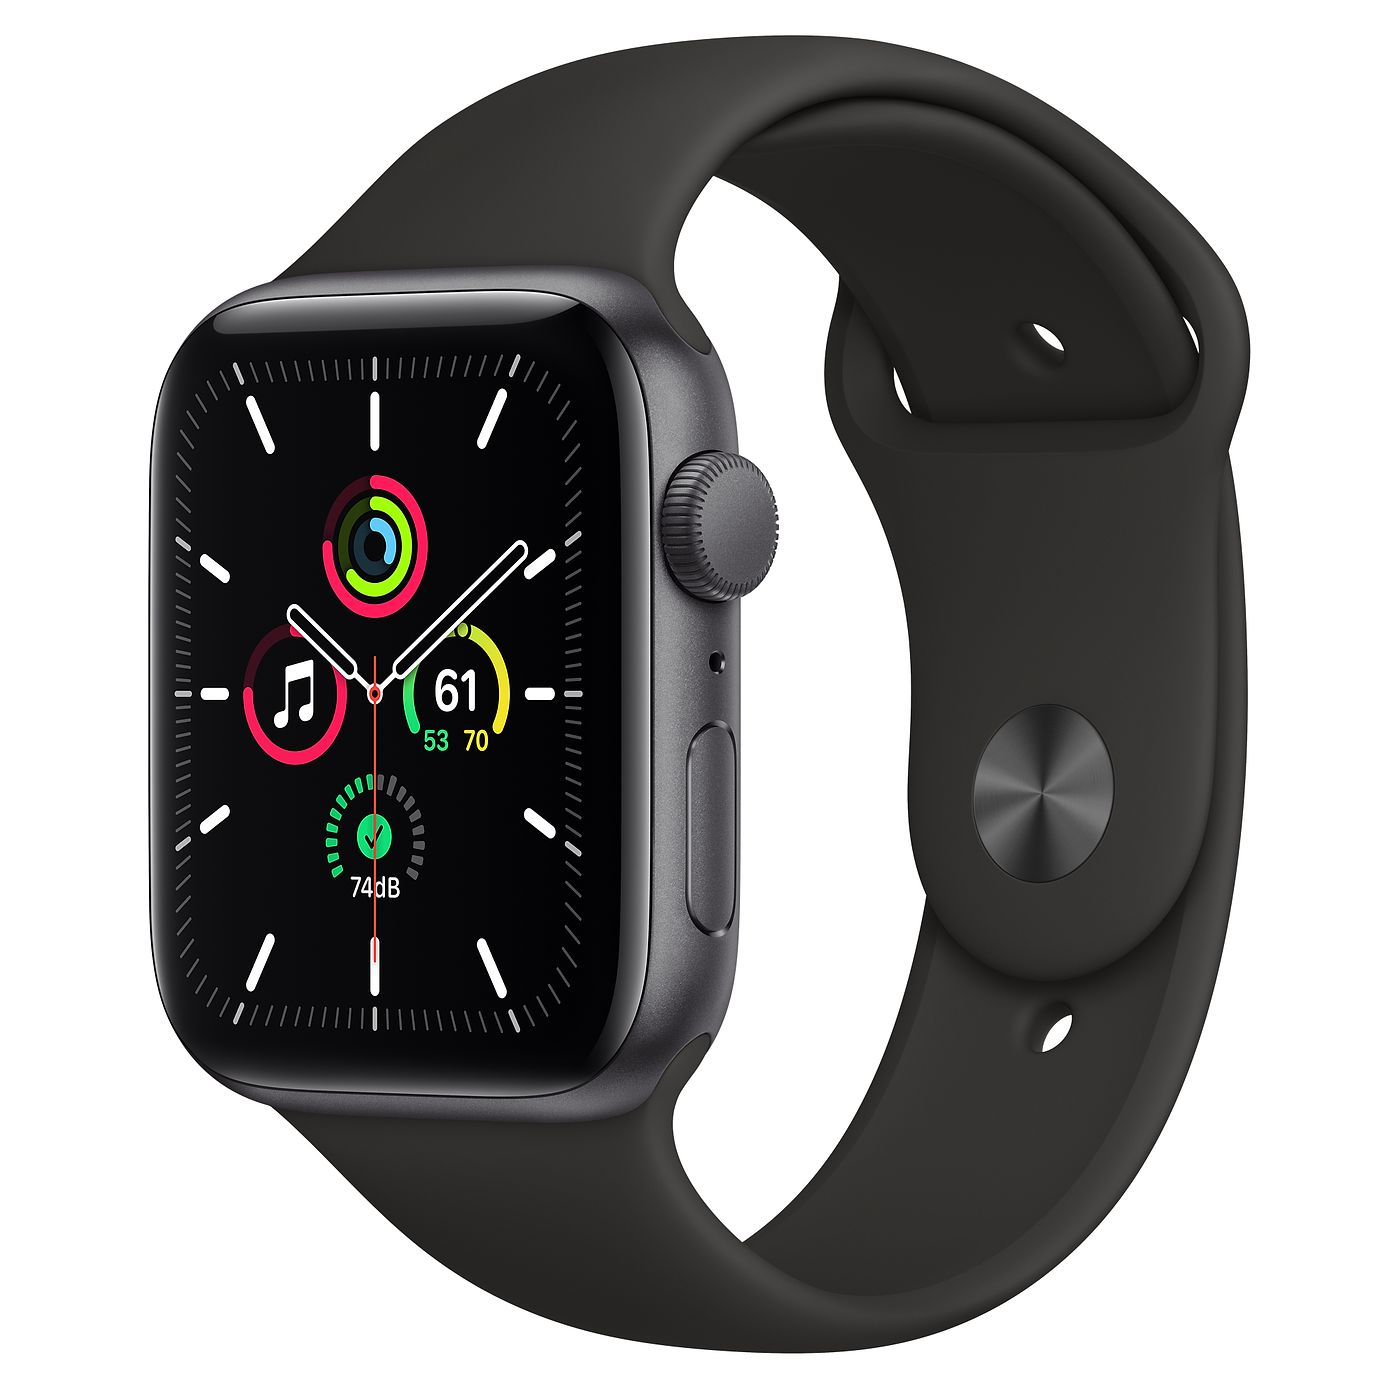 Apple 2020년 애플워치 SE GPS 44mm 레귤러  스페이스 그레이 알루미늄(케이스)  블랙(스포츠 밴드)